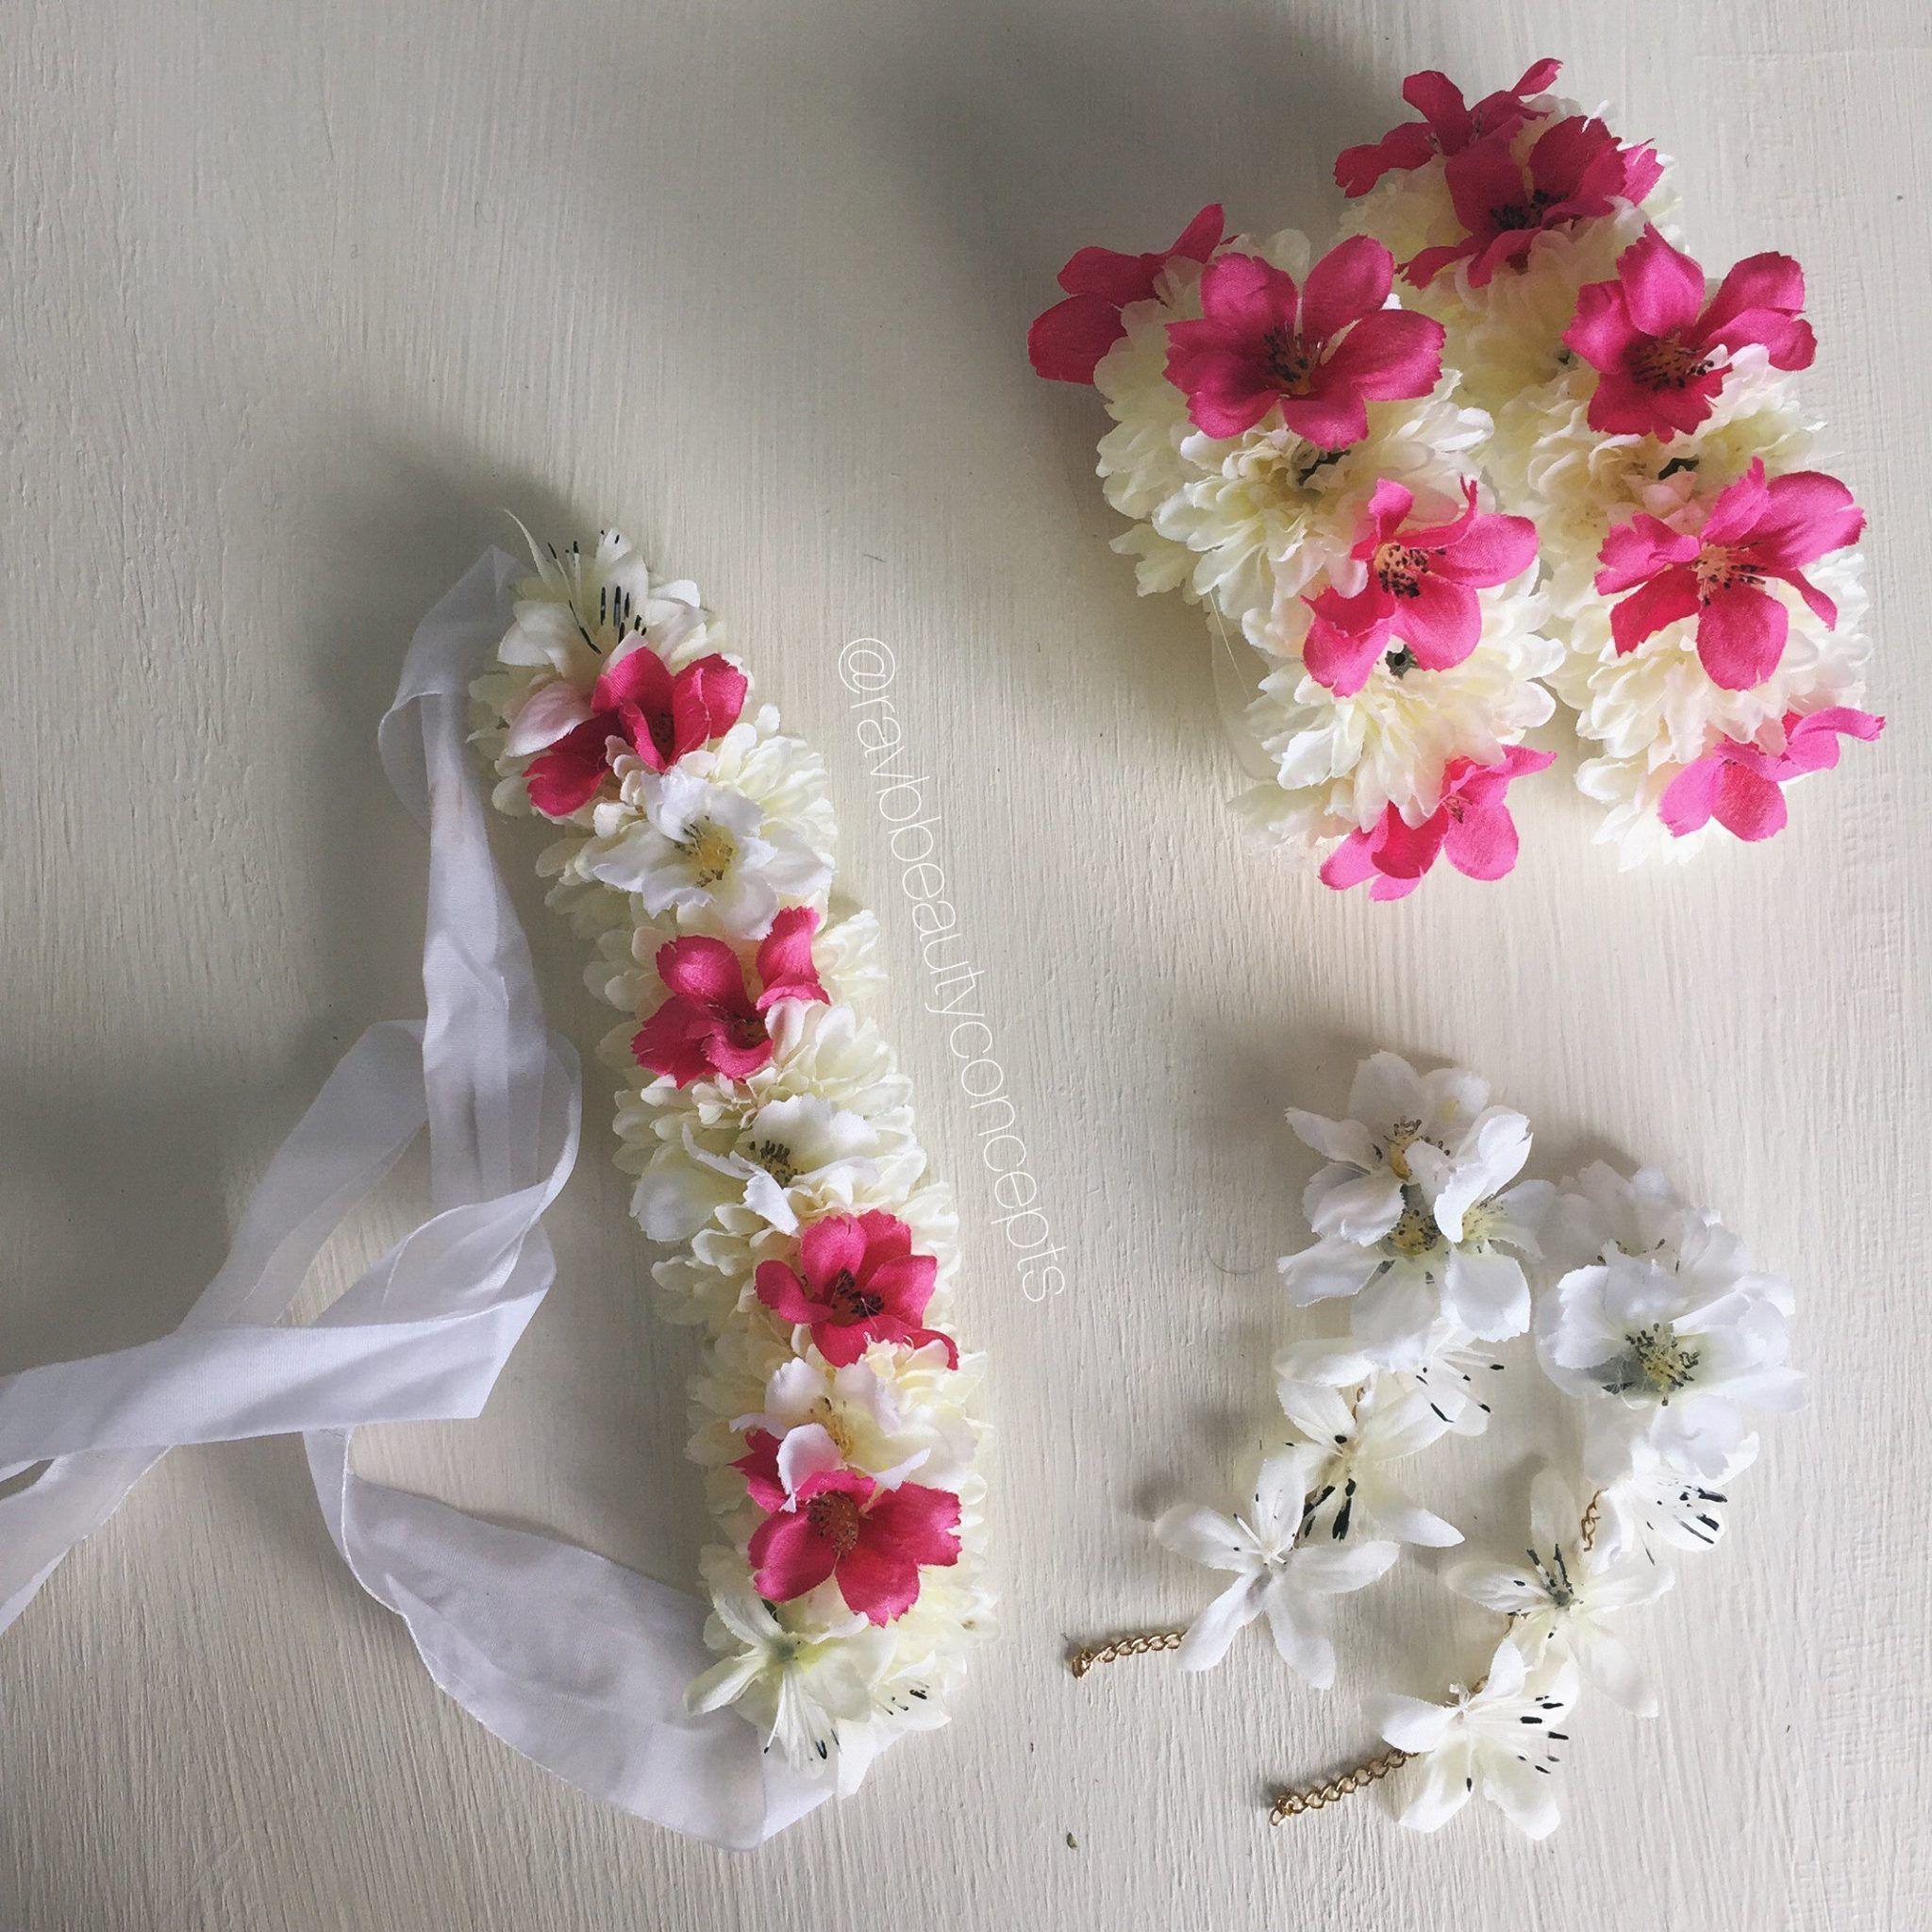 by: RAV B BEAUTY // floral jewellery, holud, holud jewellery ...